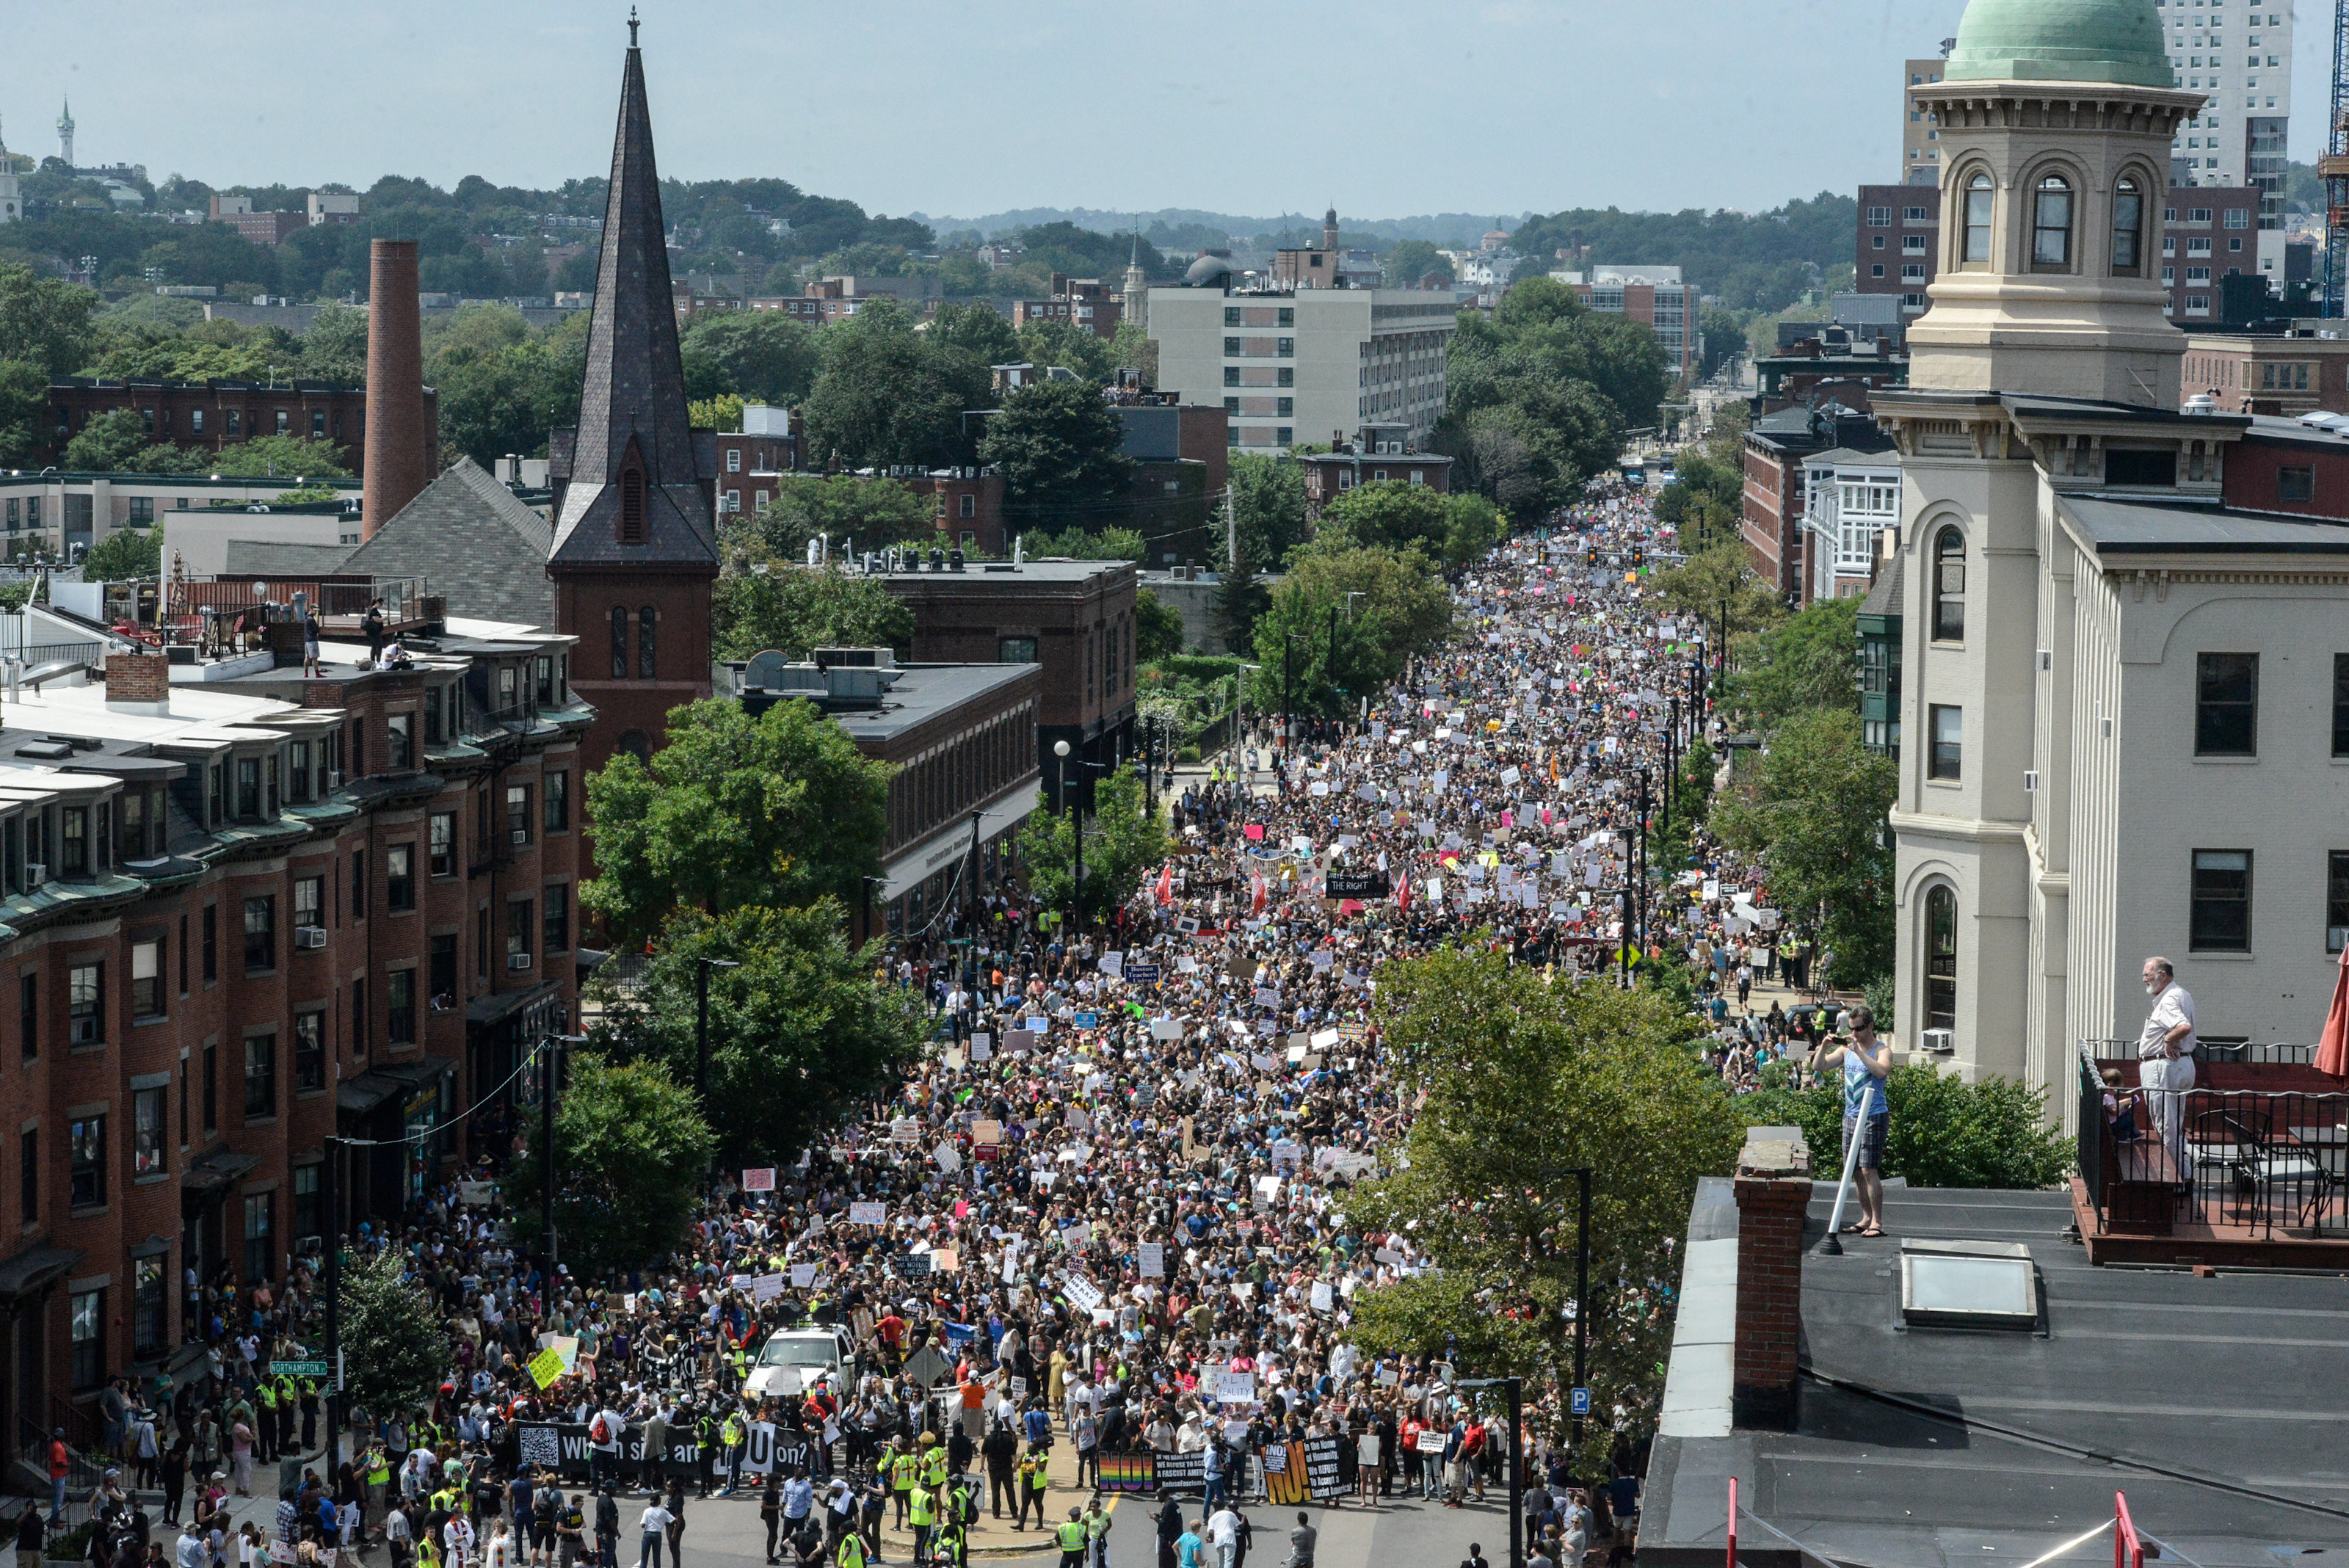 Многотысячный марш в Бостоне. Фото: © REUTERS/Stephanie Keith